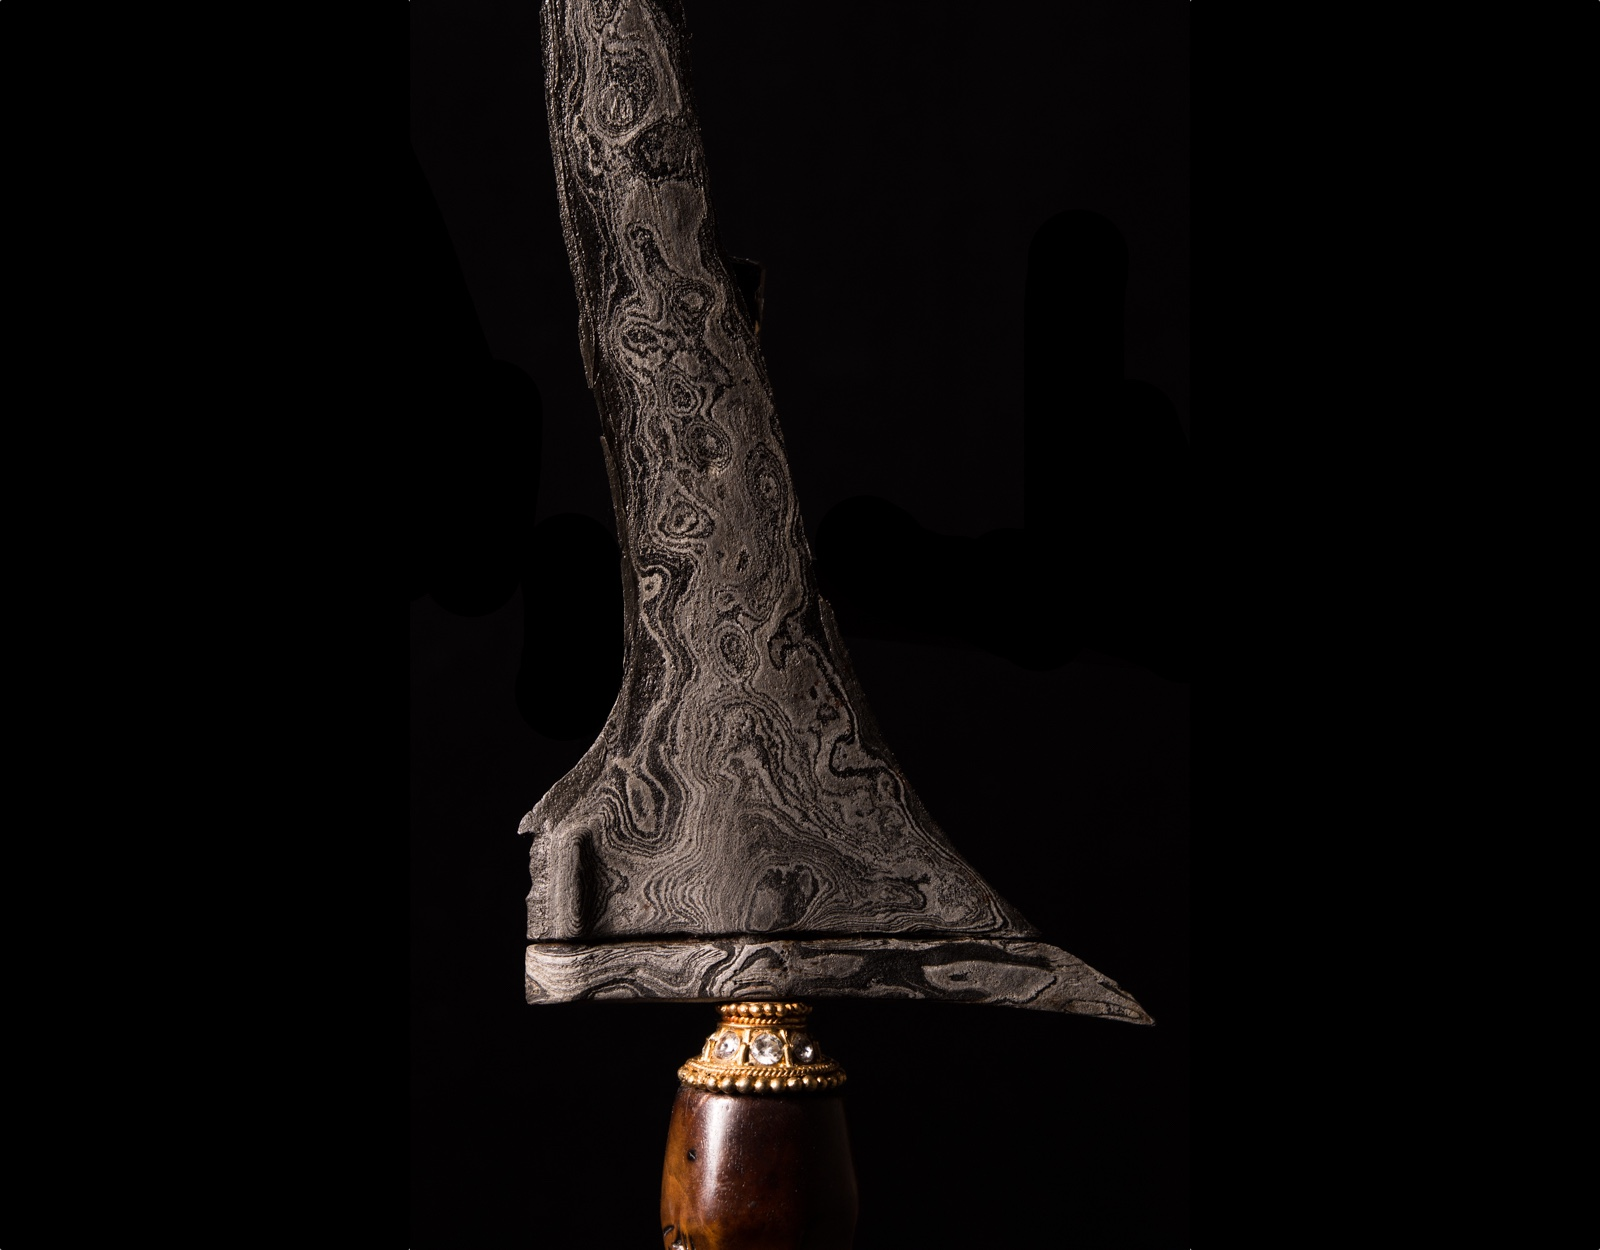 Нож Крис Sempana Luk 9, работа с деньгами. фото VipKeris